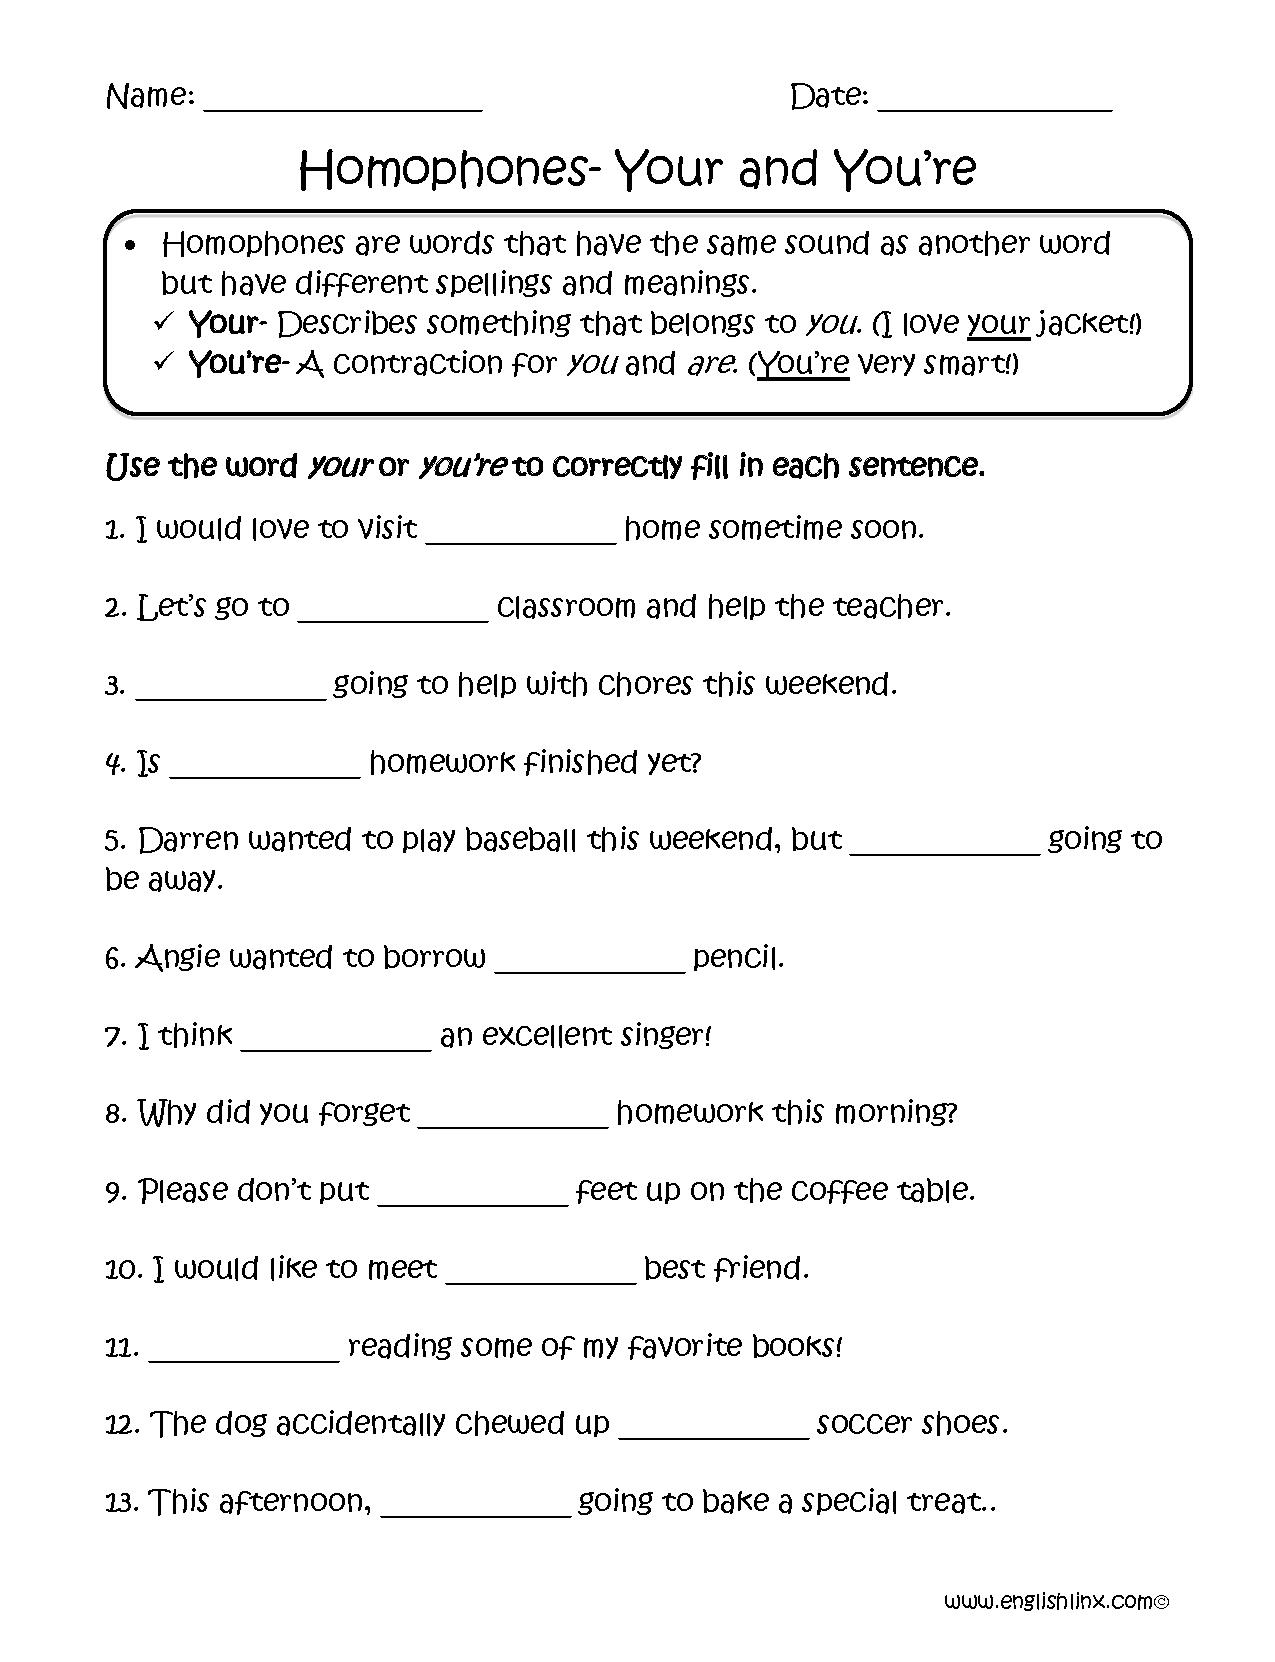 Homophone Worksheet 3rd Grade: englishlinx homophones worksheets,